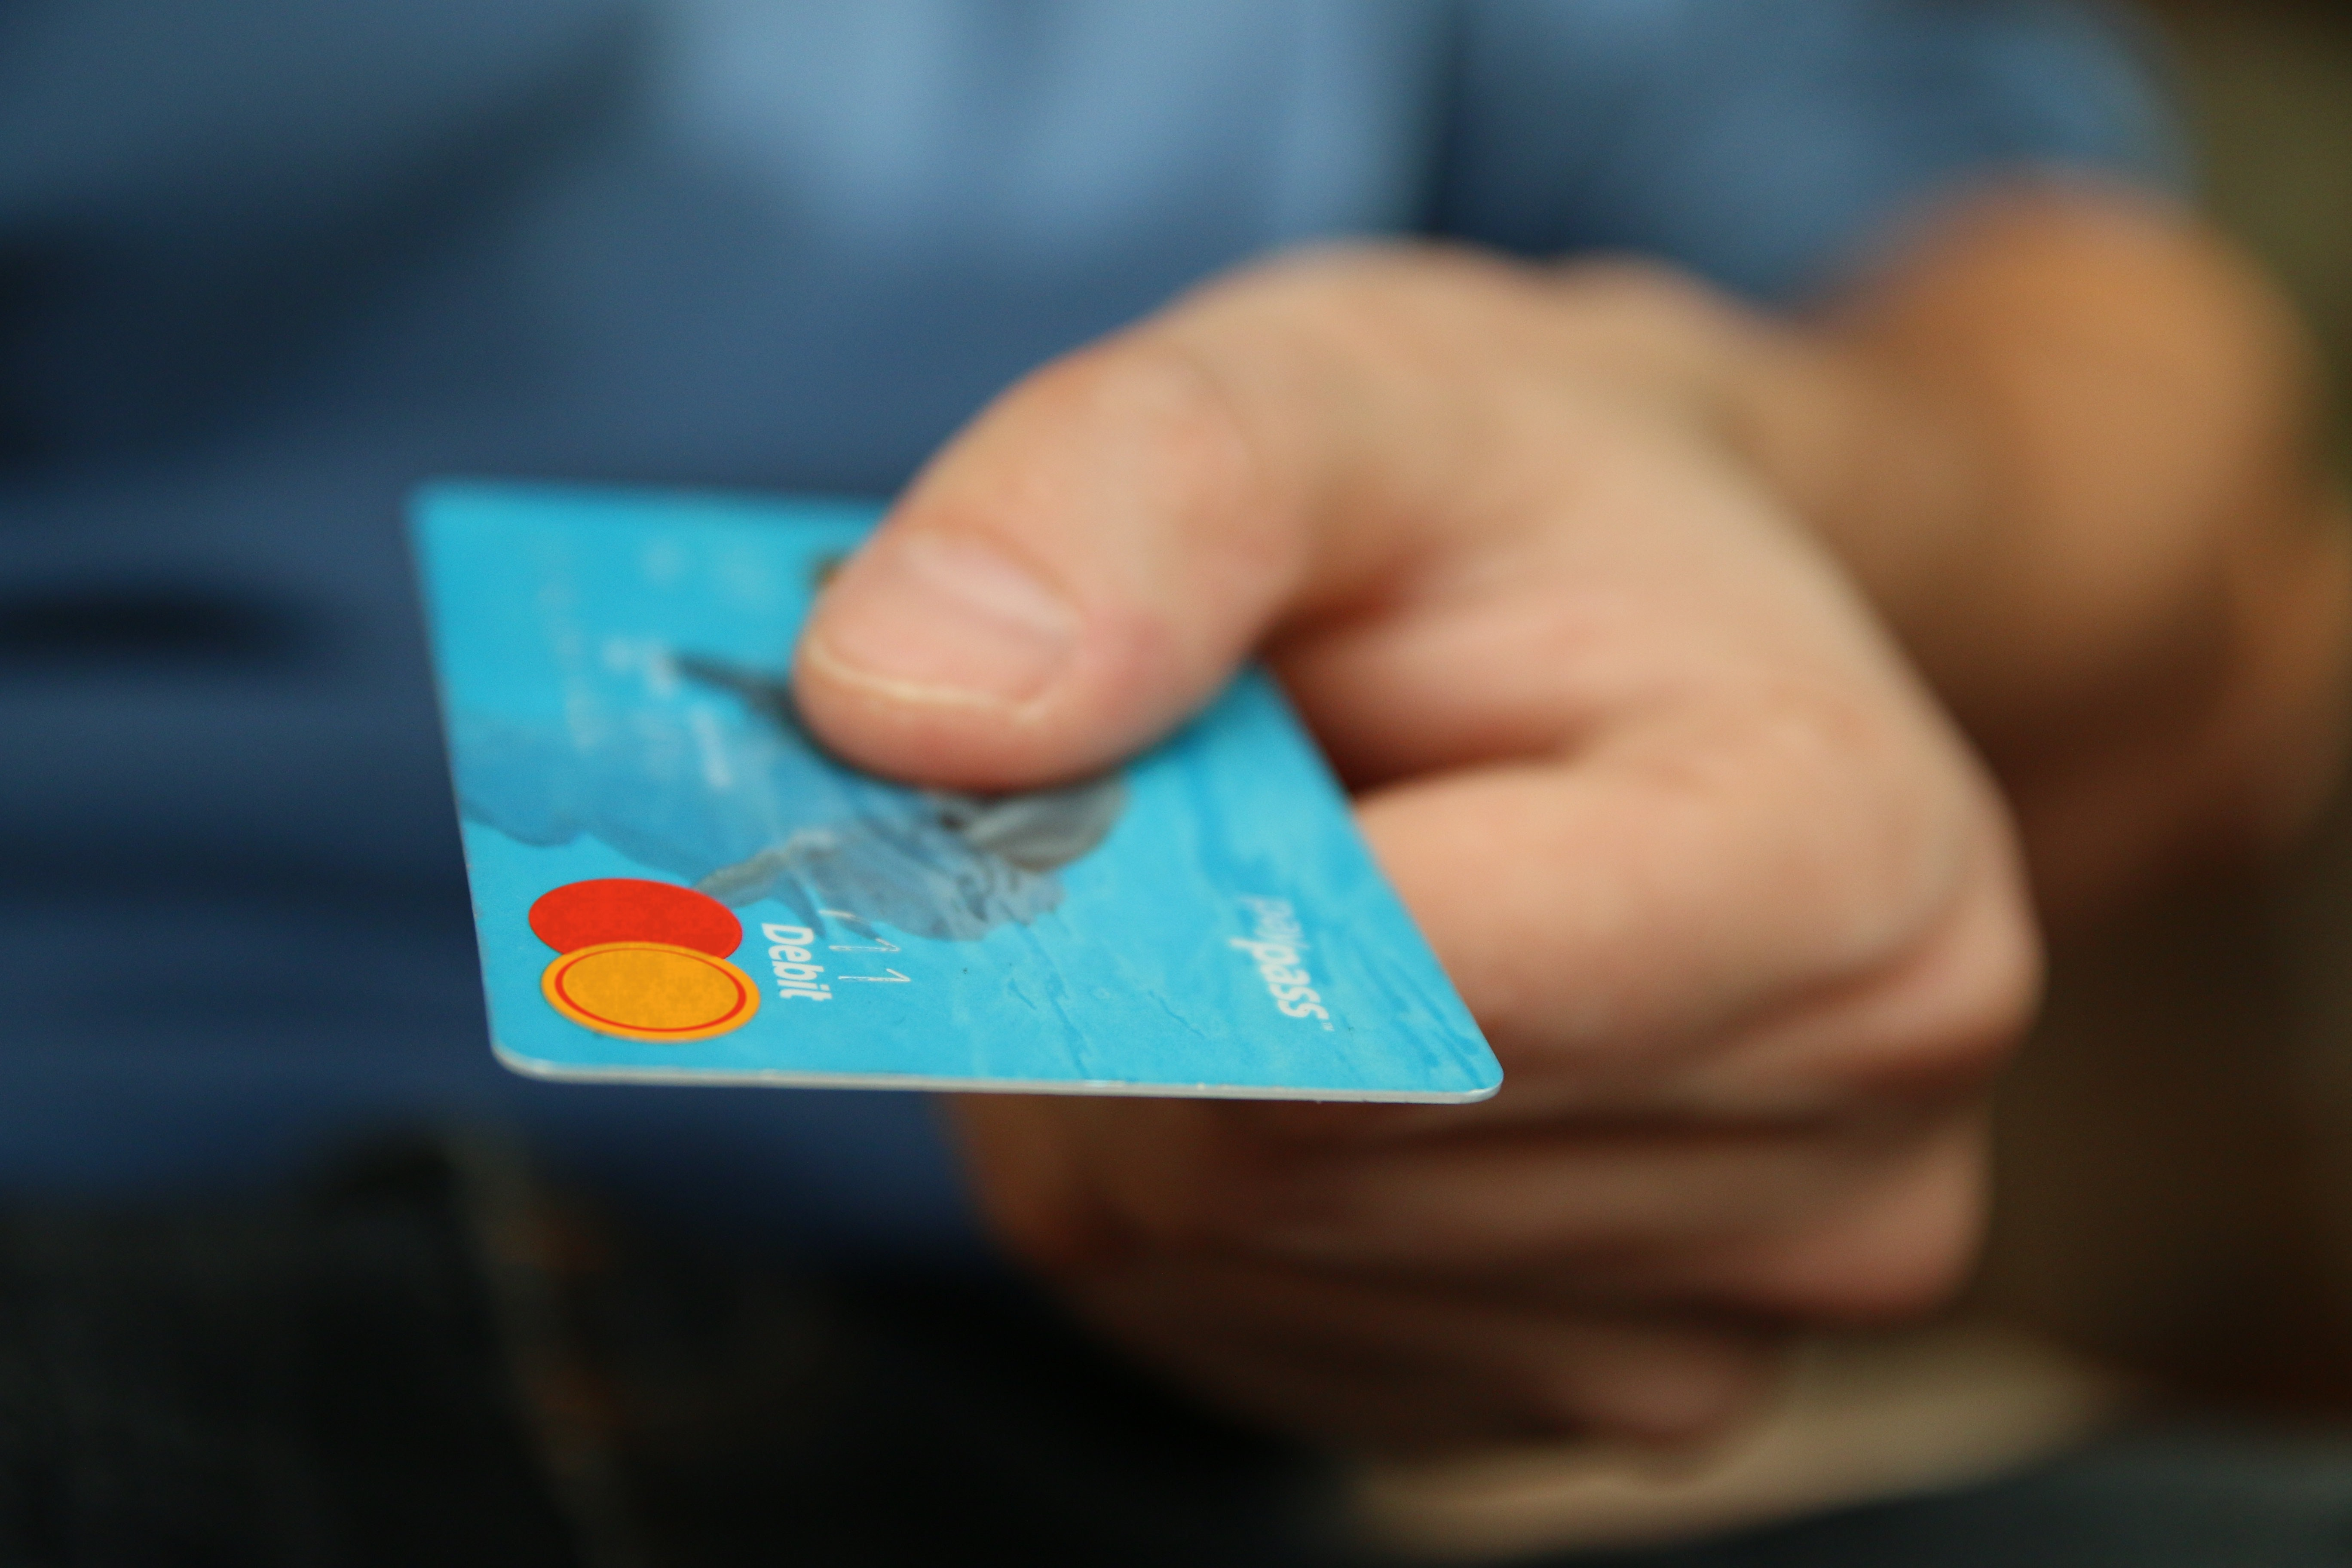 AdvCash Debit Card program for Russia is now live